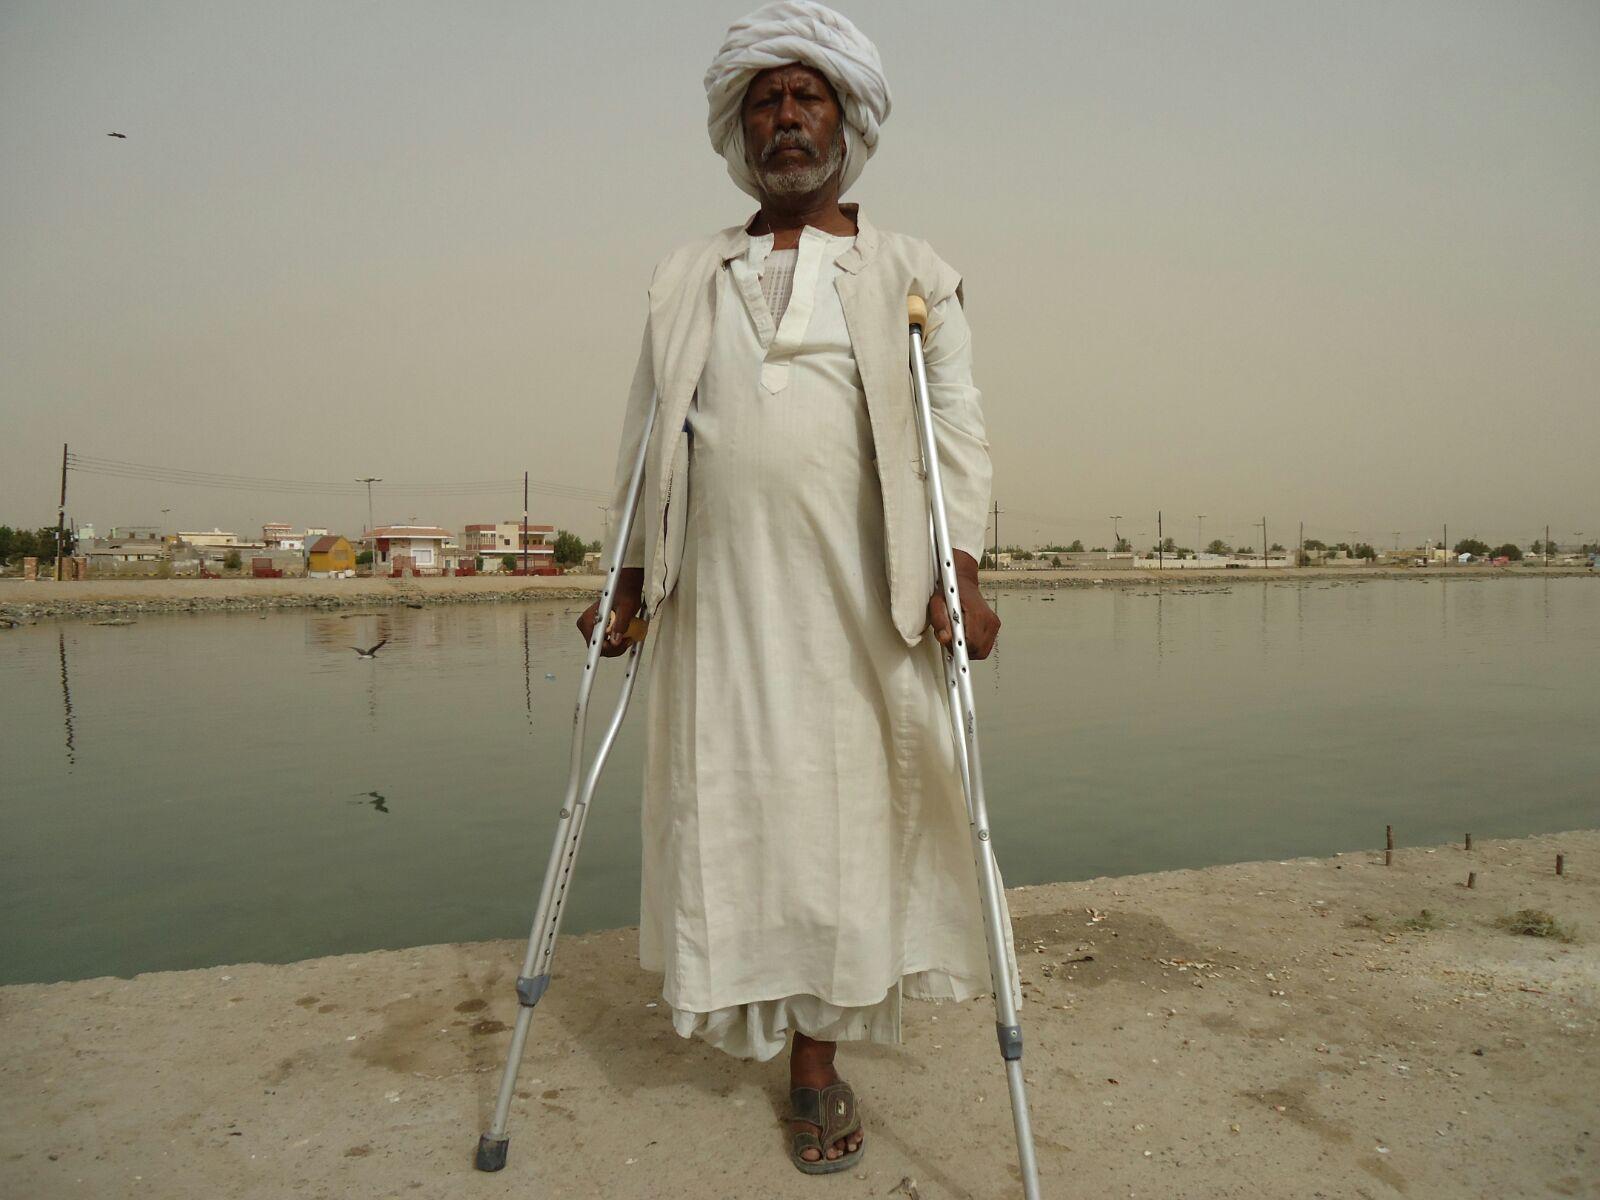 Fisherman 51 years old SOS Sahel Suakin Town, Red Sea State